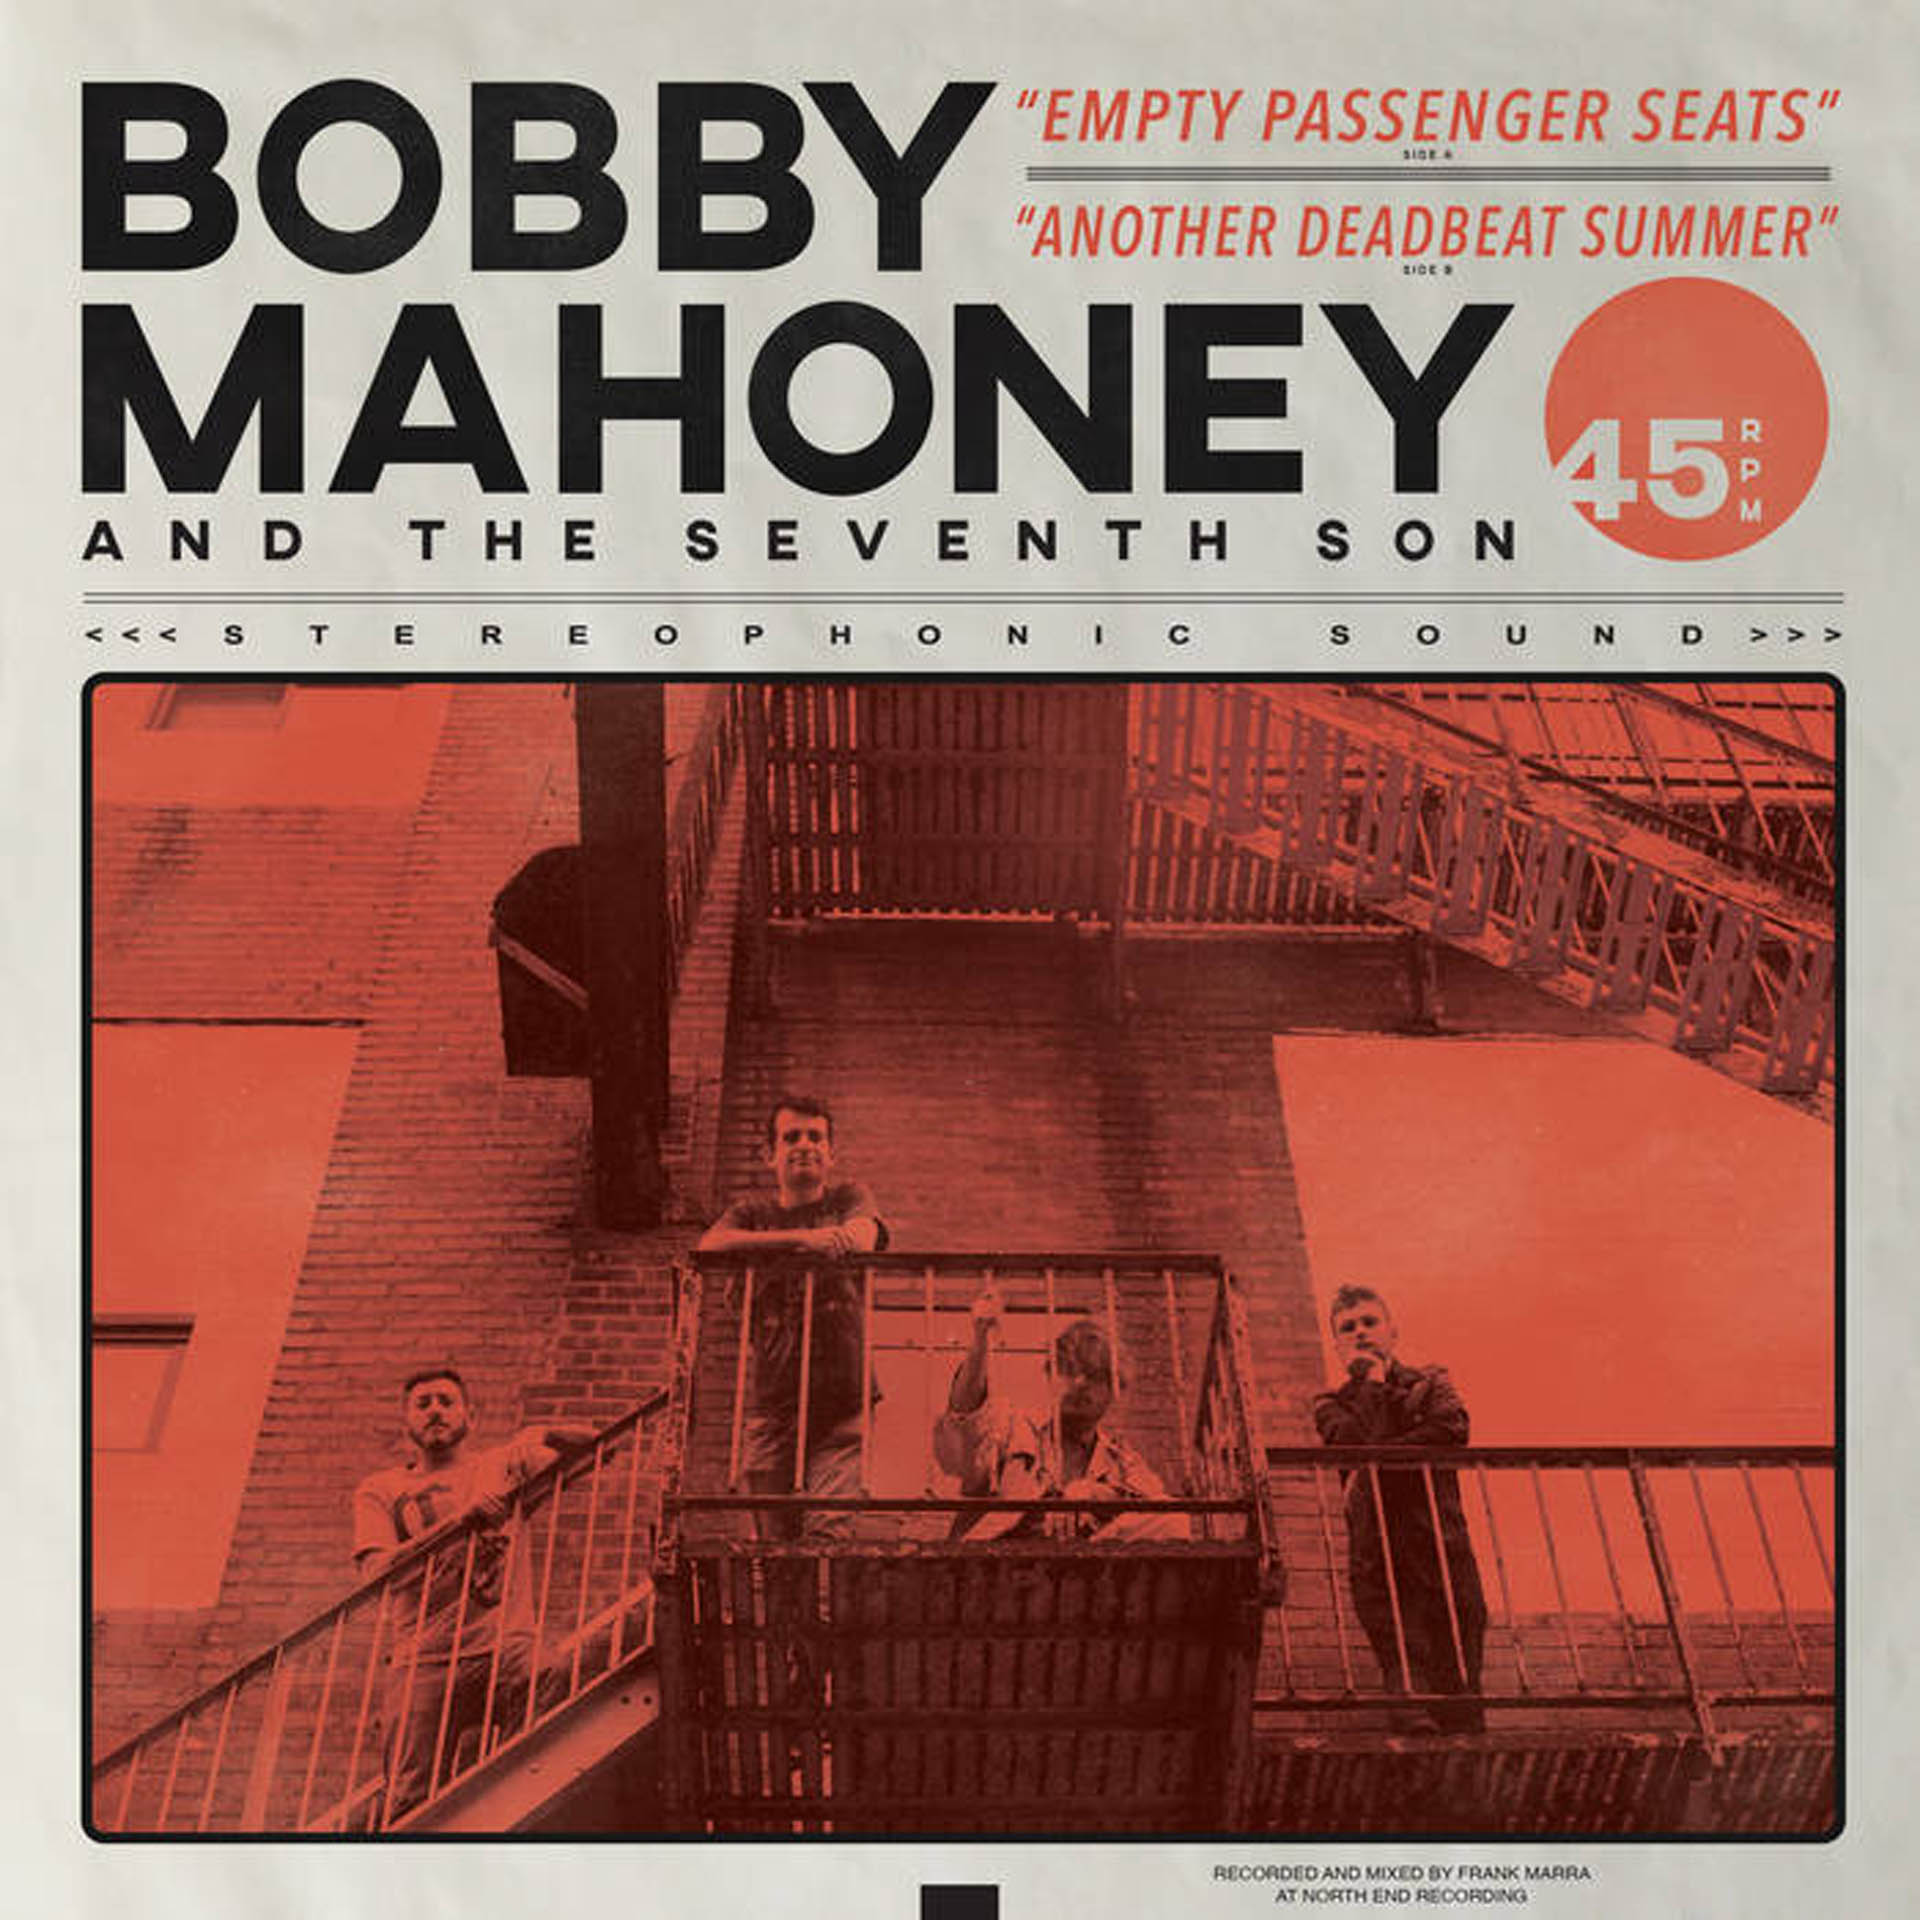 Bobby Mahoney and the Seventh Son - Empty Passenger Seats.jpg